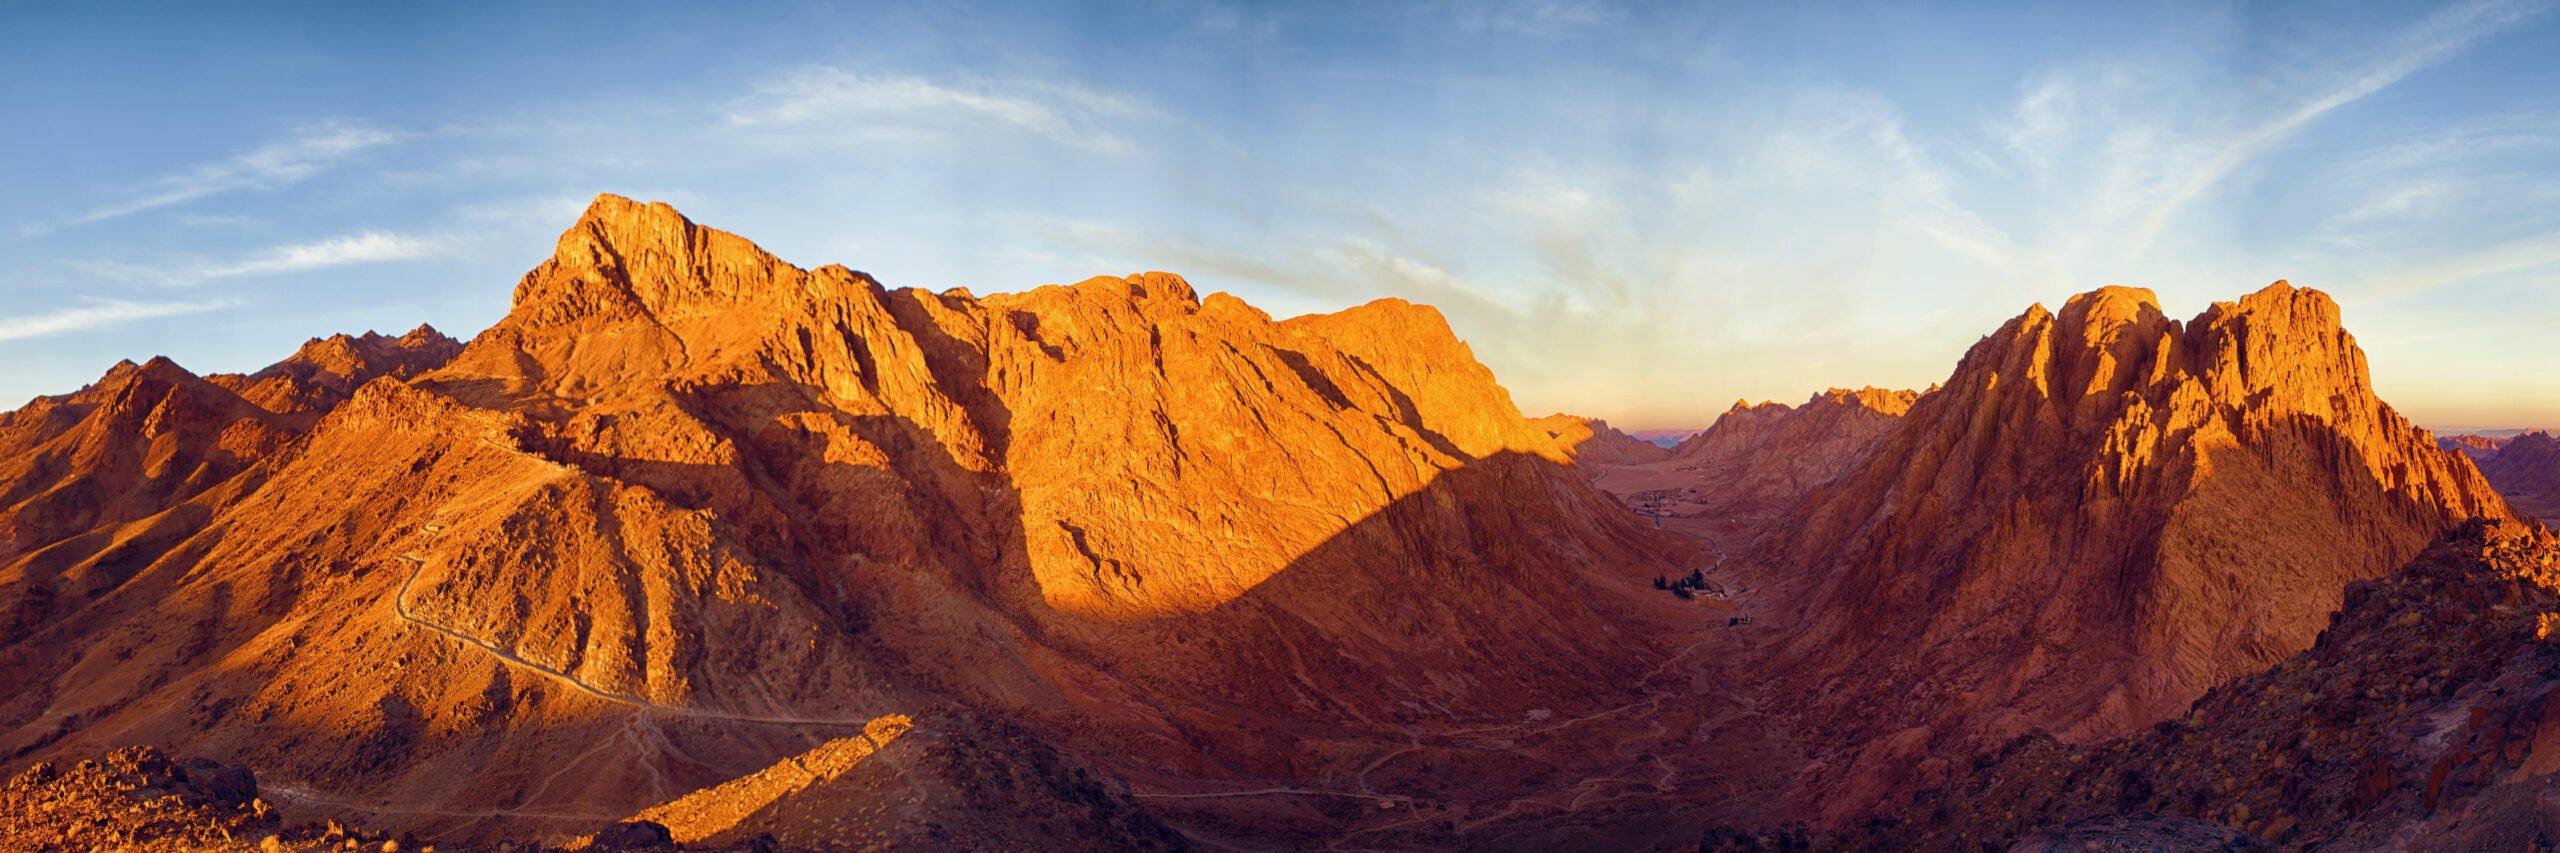 Mount Sinai Sunrise Tour